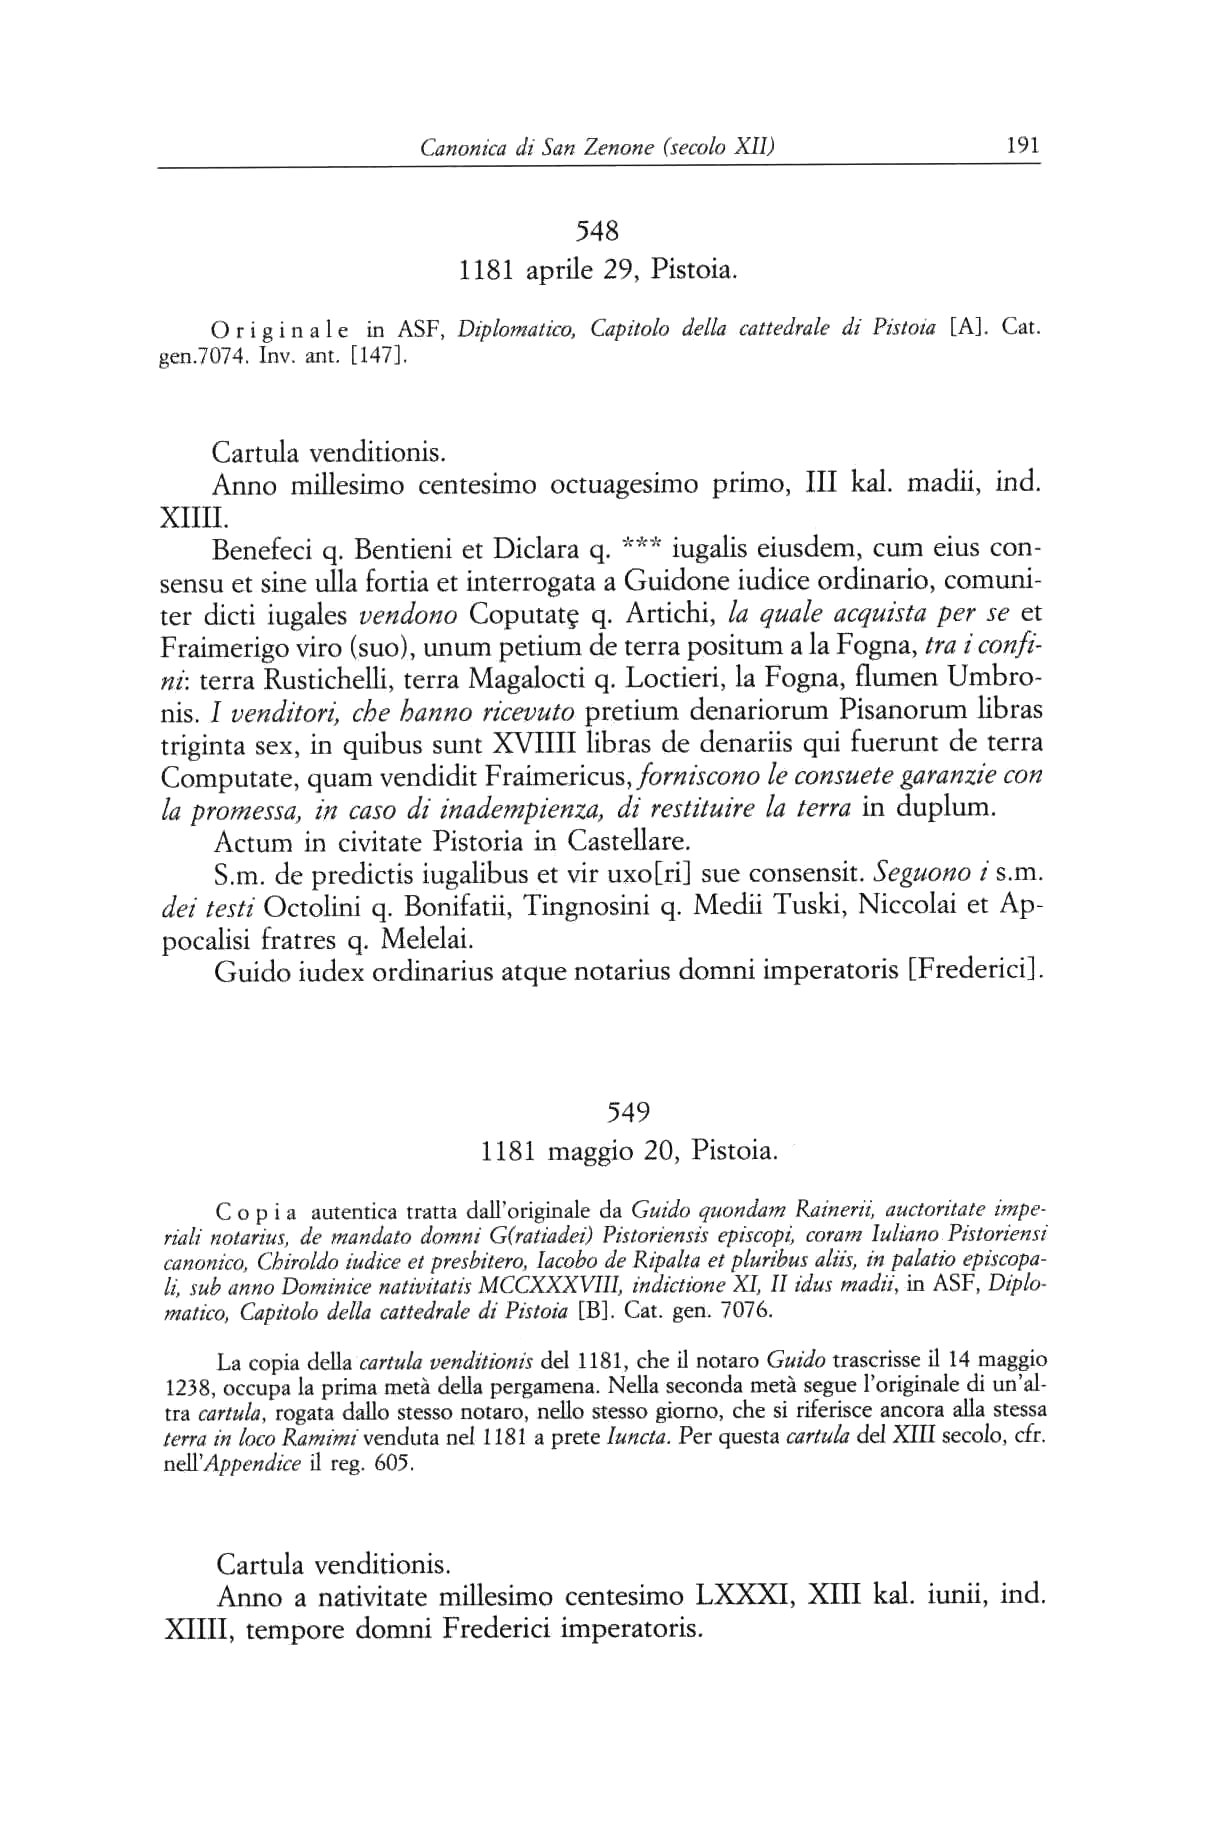 Canonica S. Zenone XII 0191.jpg